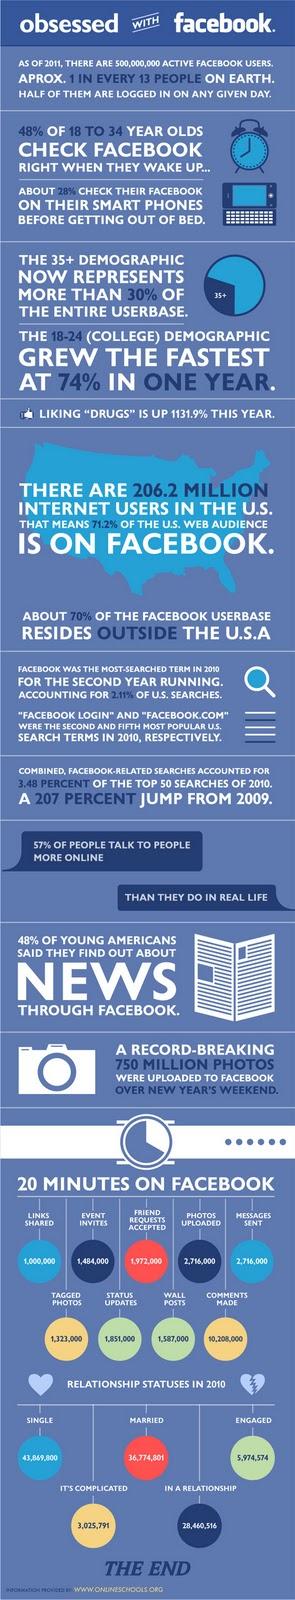 Facebook-Statistics-Facebook-Stats-Facts-2011